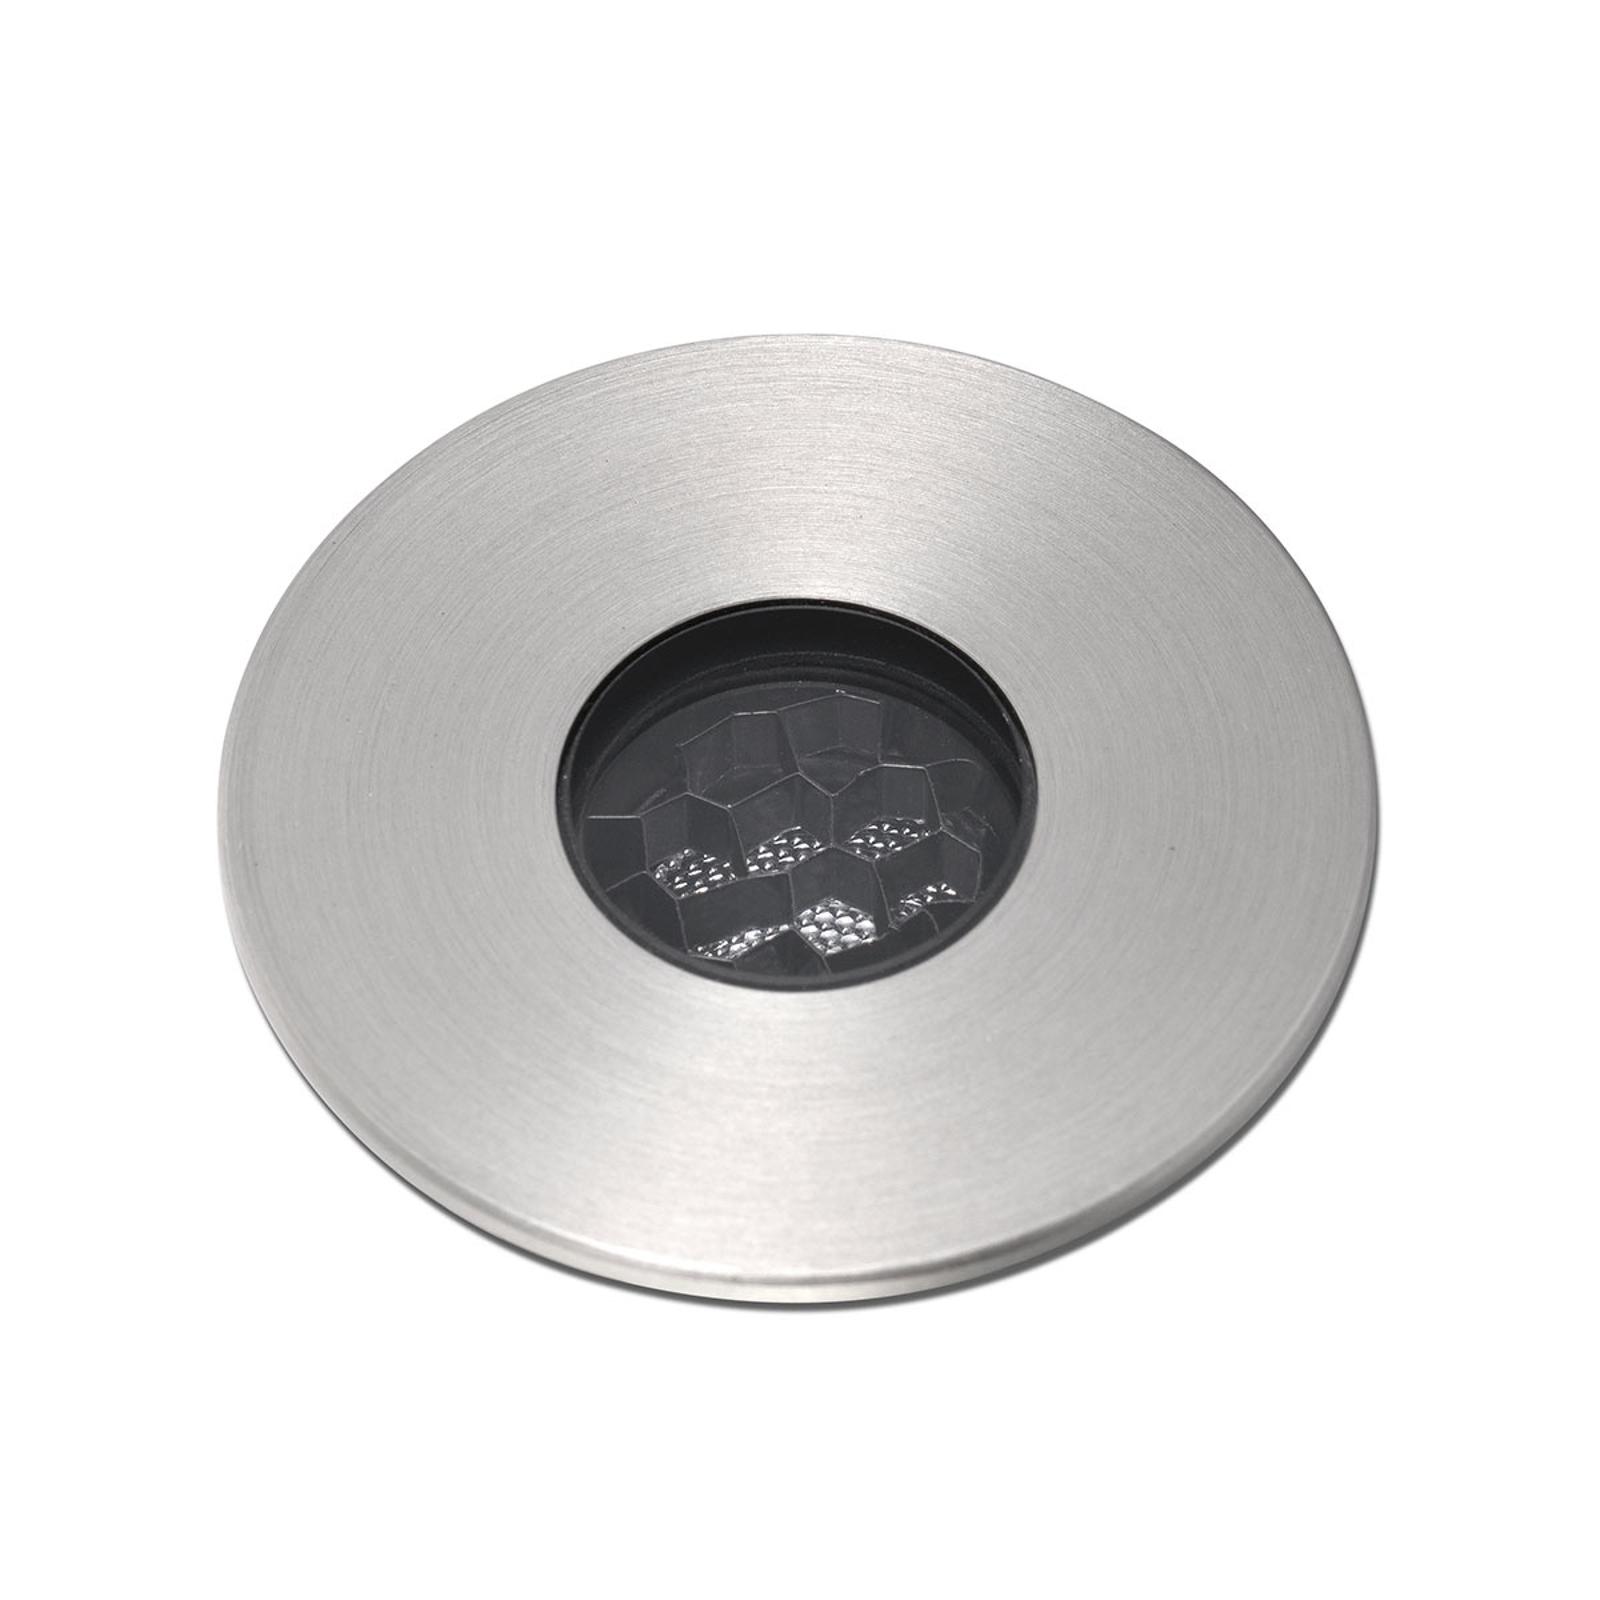 Zeewaterbestendige LED inbouwspot Grund Ø 3,5 cm